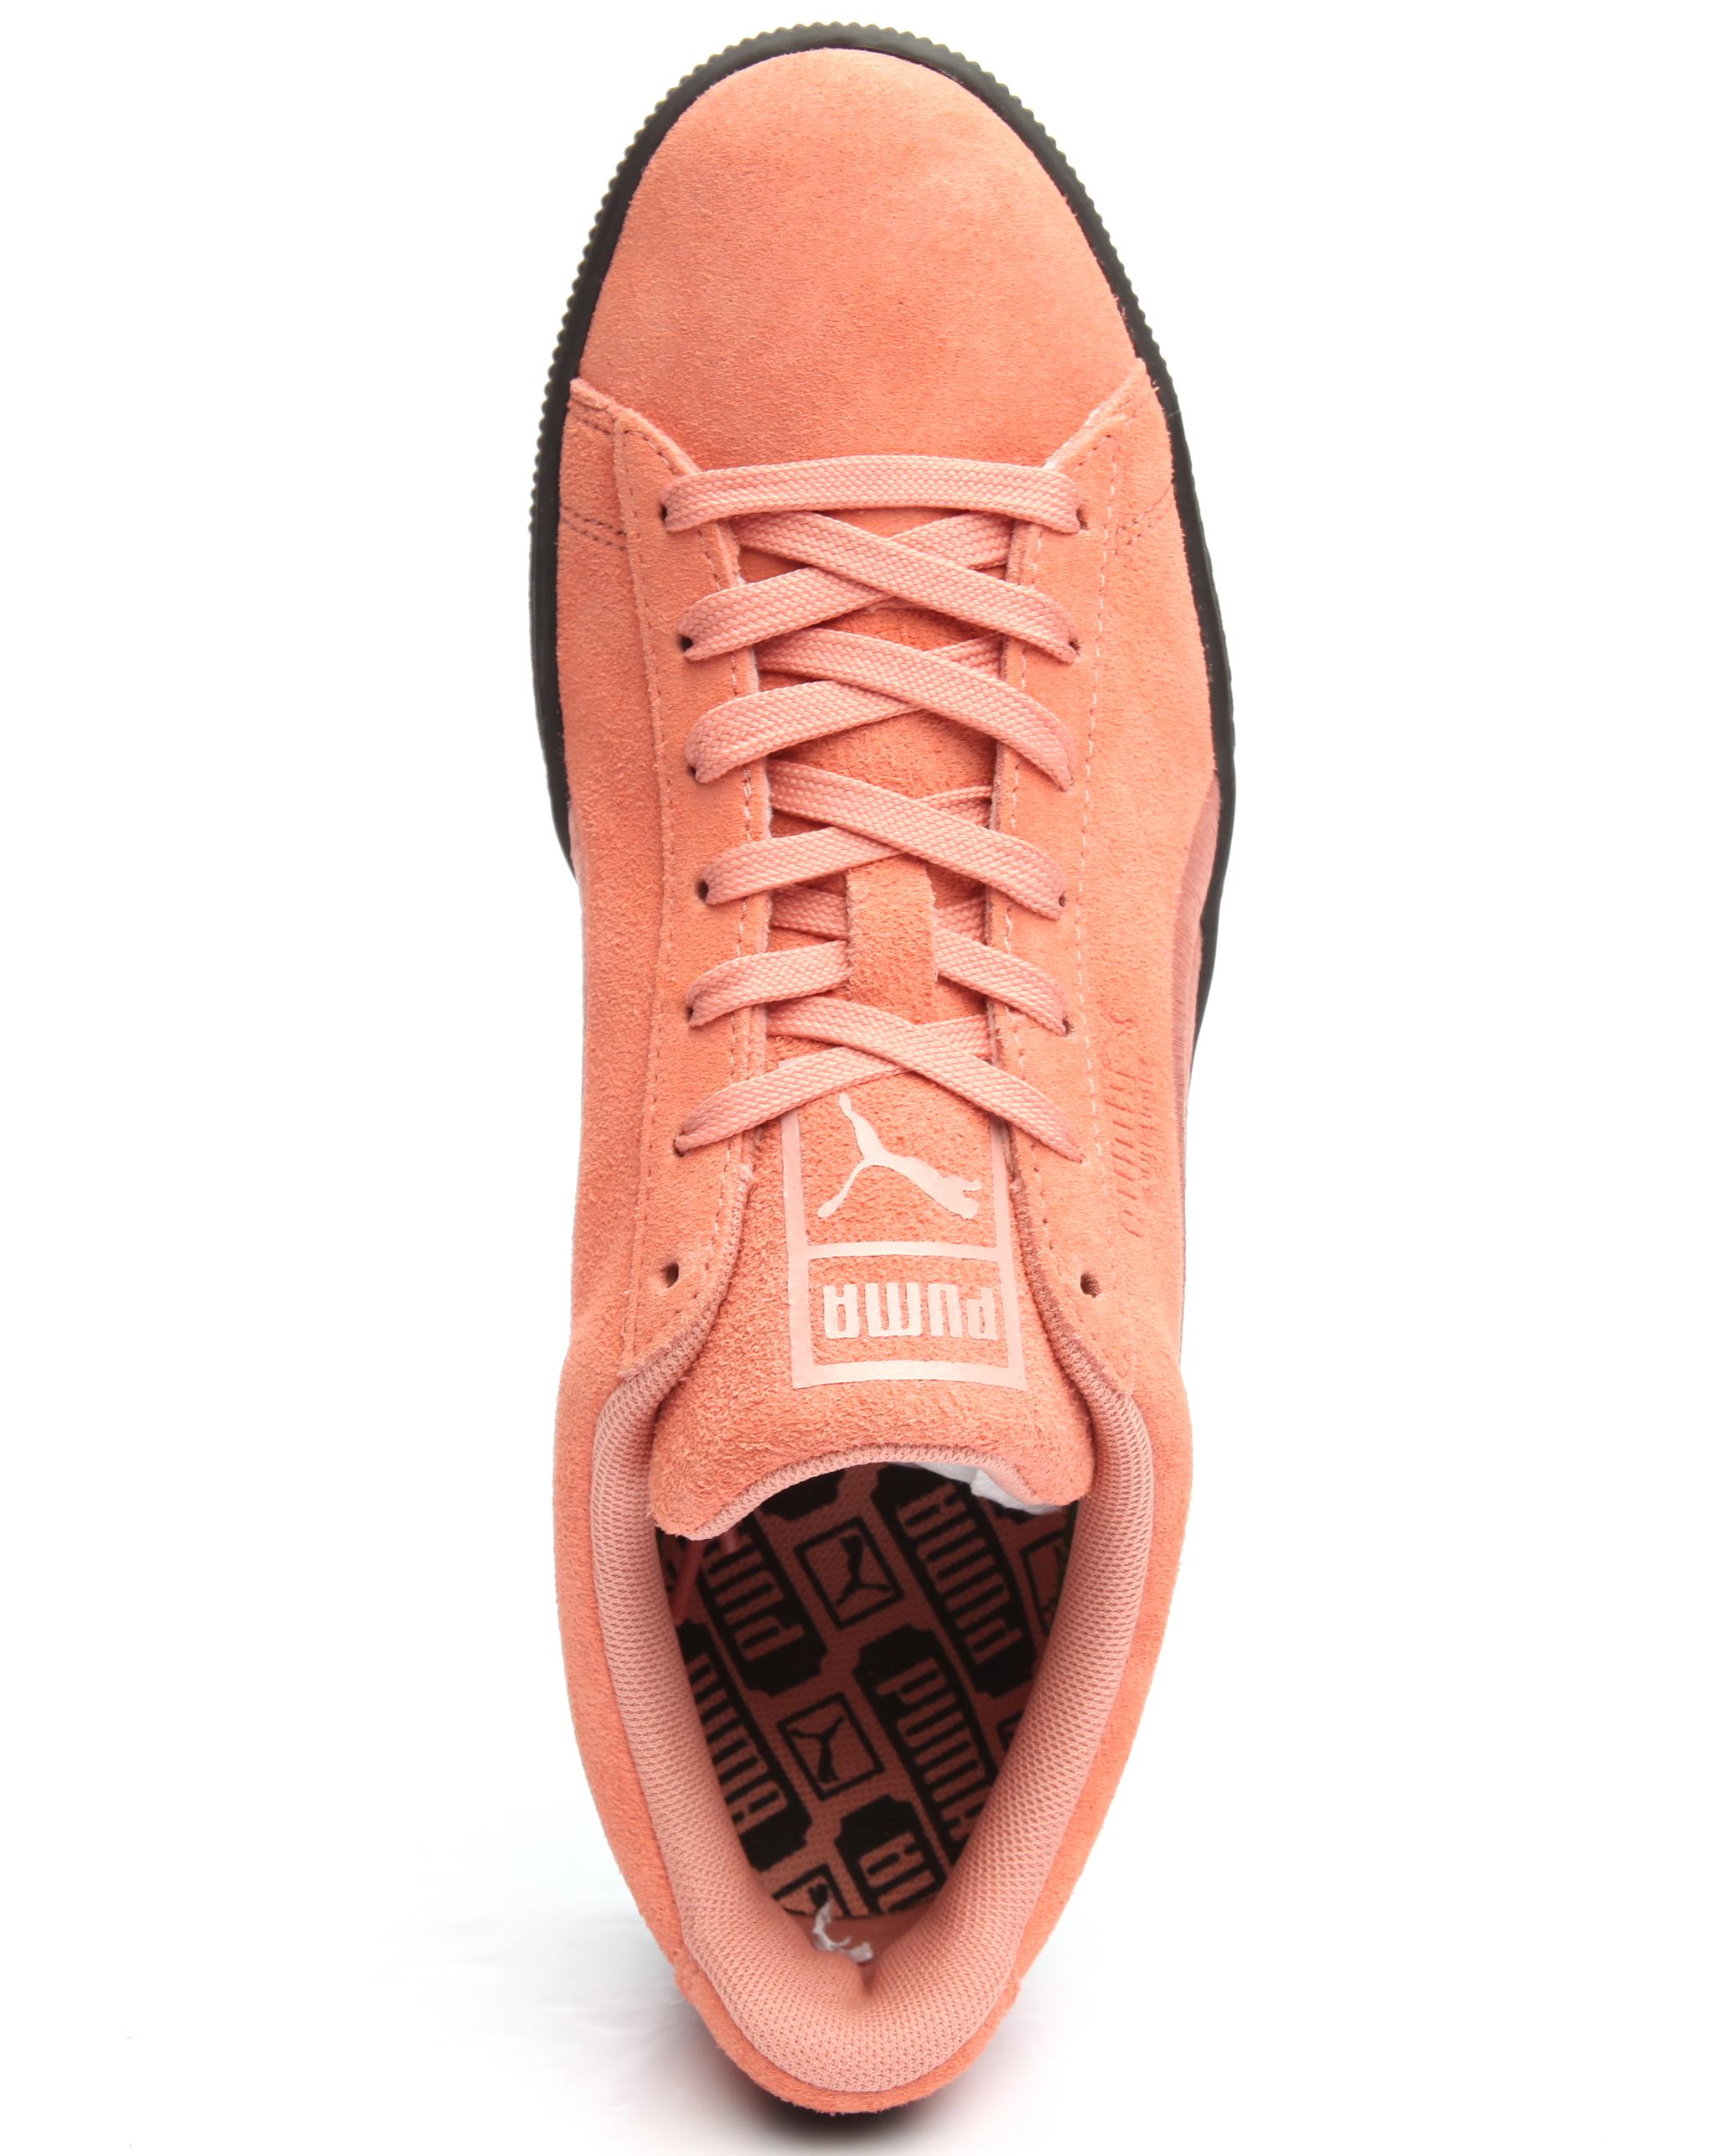 Buy Suede Classic Badge Flip Em Sneakers Men's Footwear from